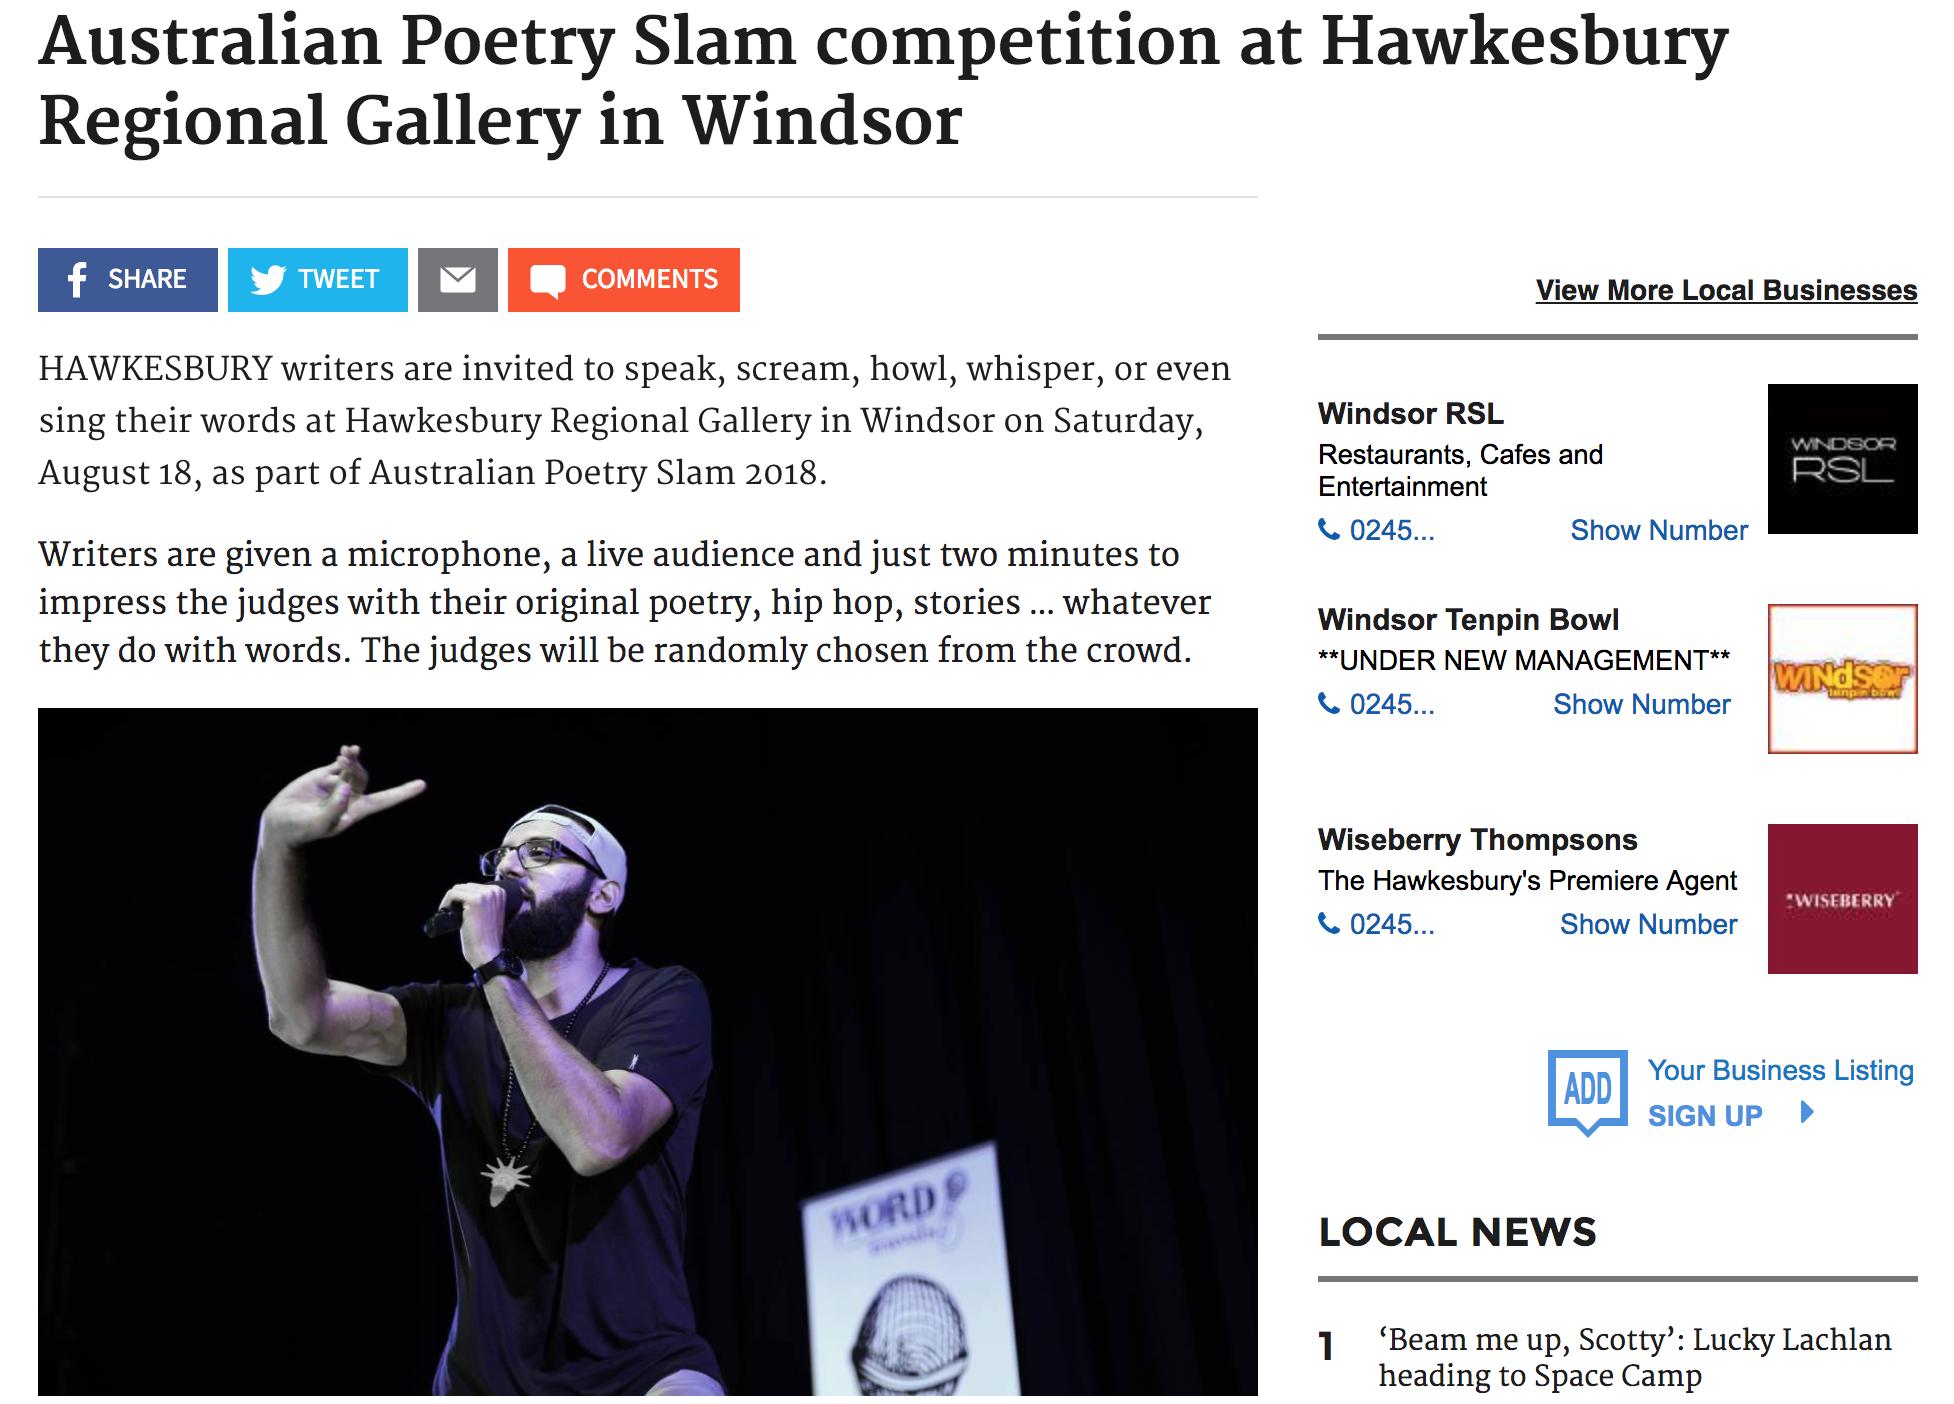 Australian Poetry Slam competition at Hawkesbury Regional Gallery in Windsor